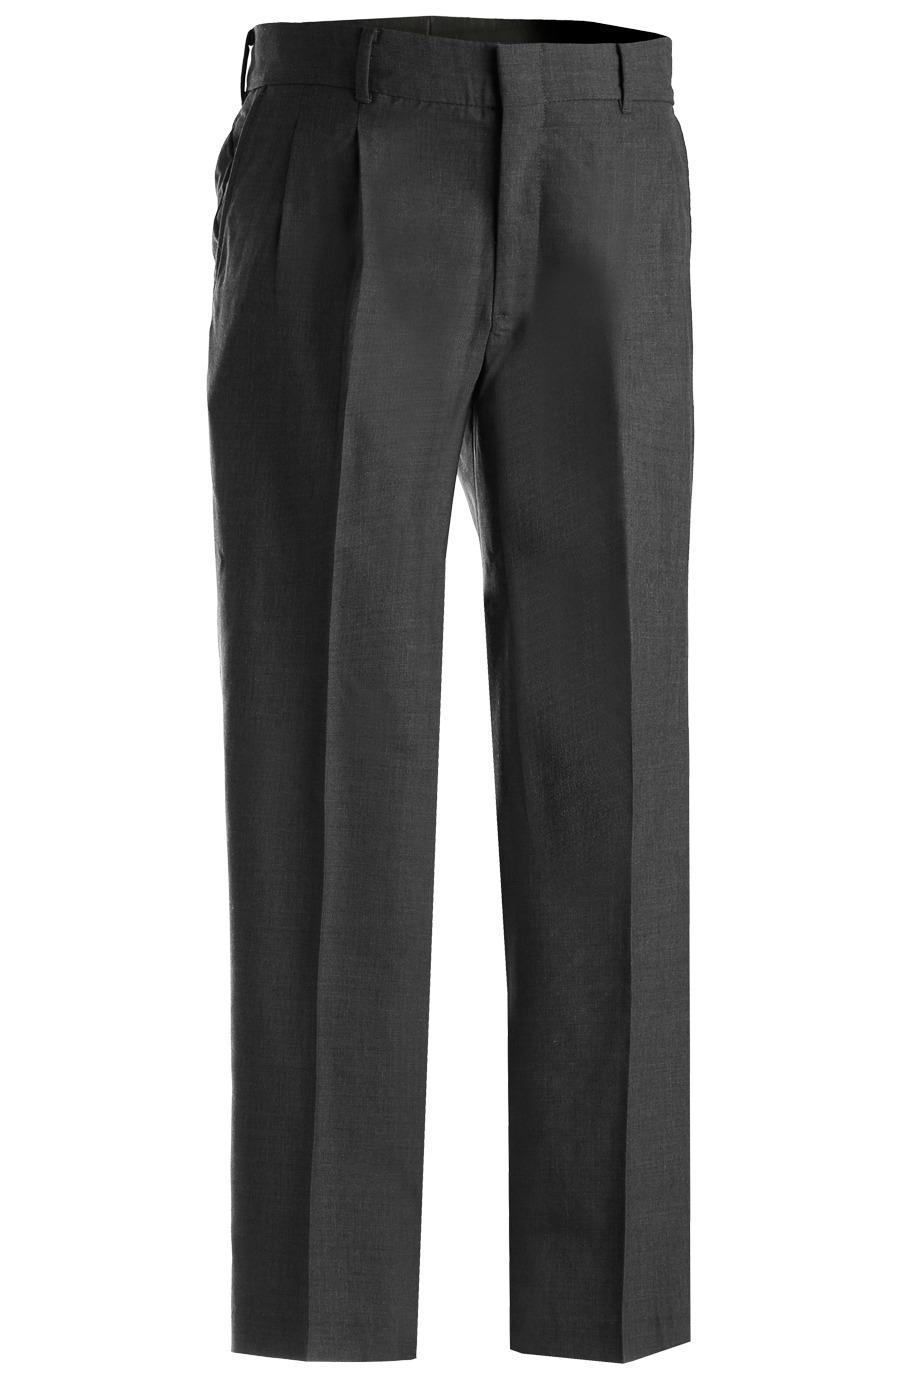 Edwards Garment Men's Lightweight Washable Pleated Dress Pant